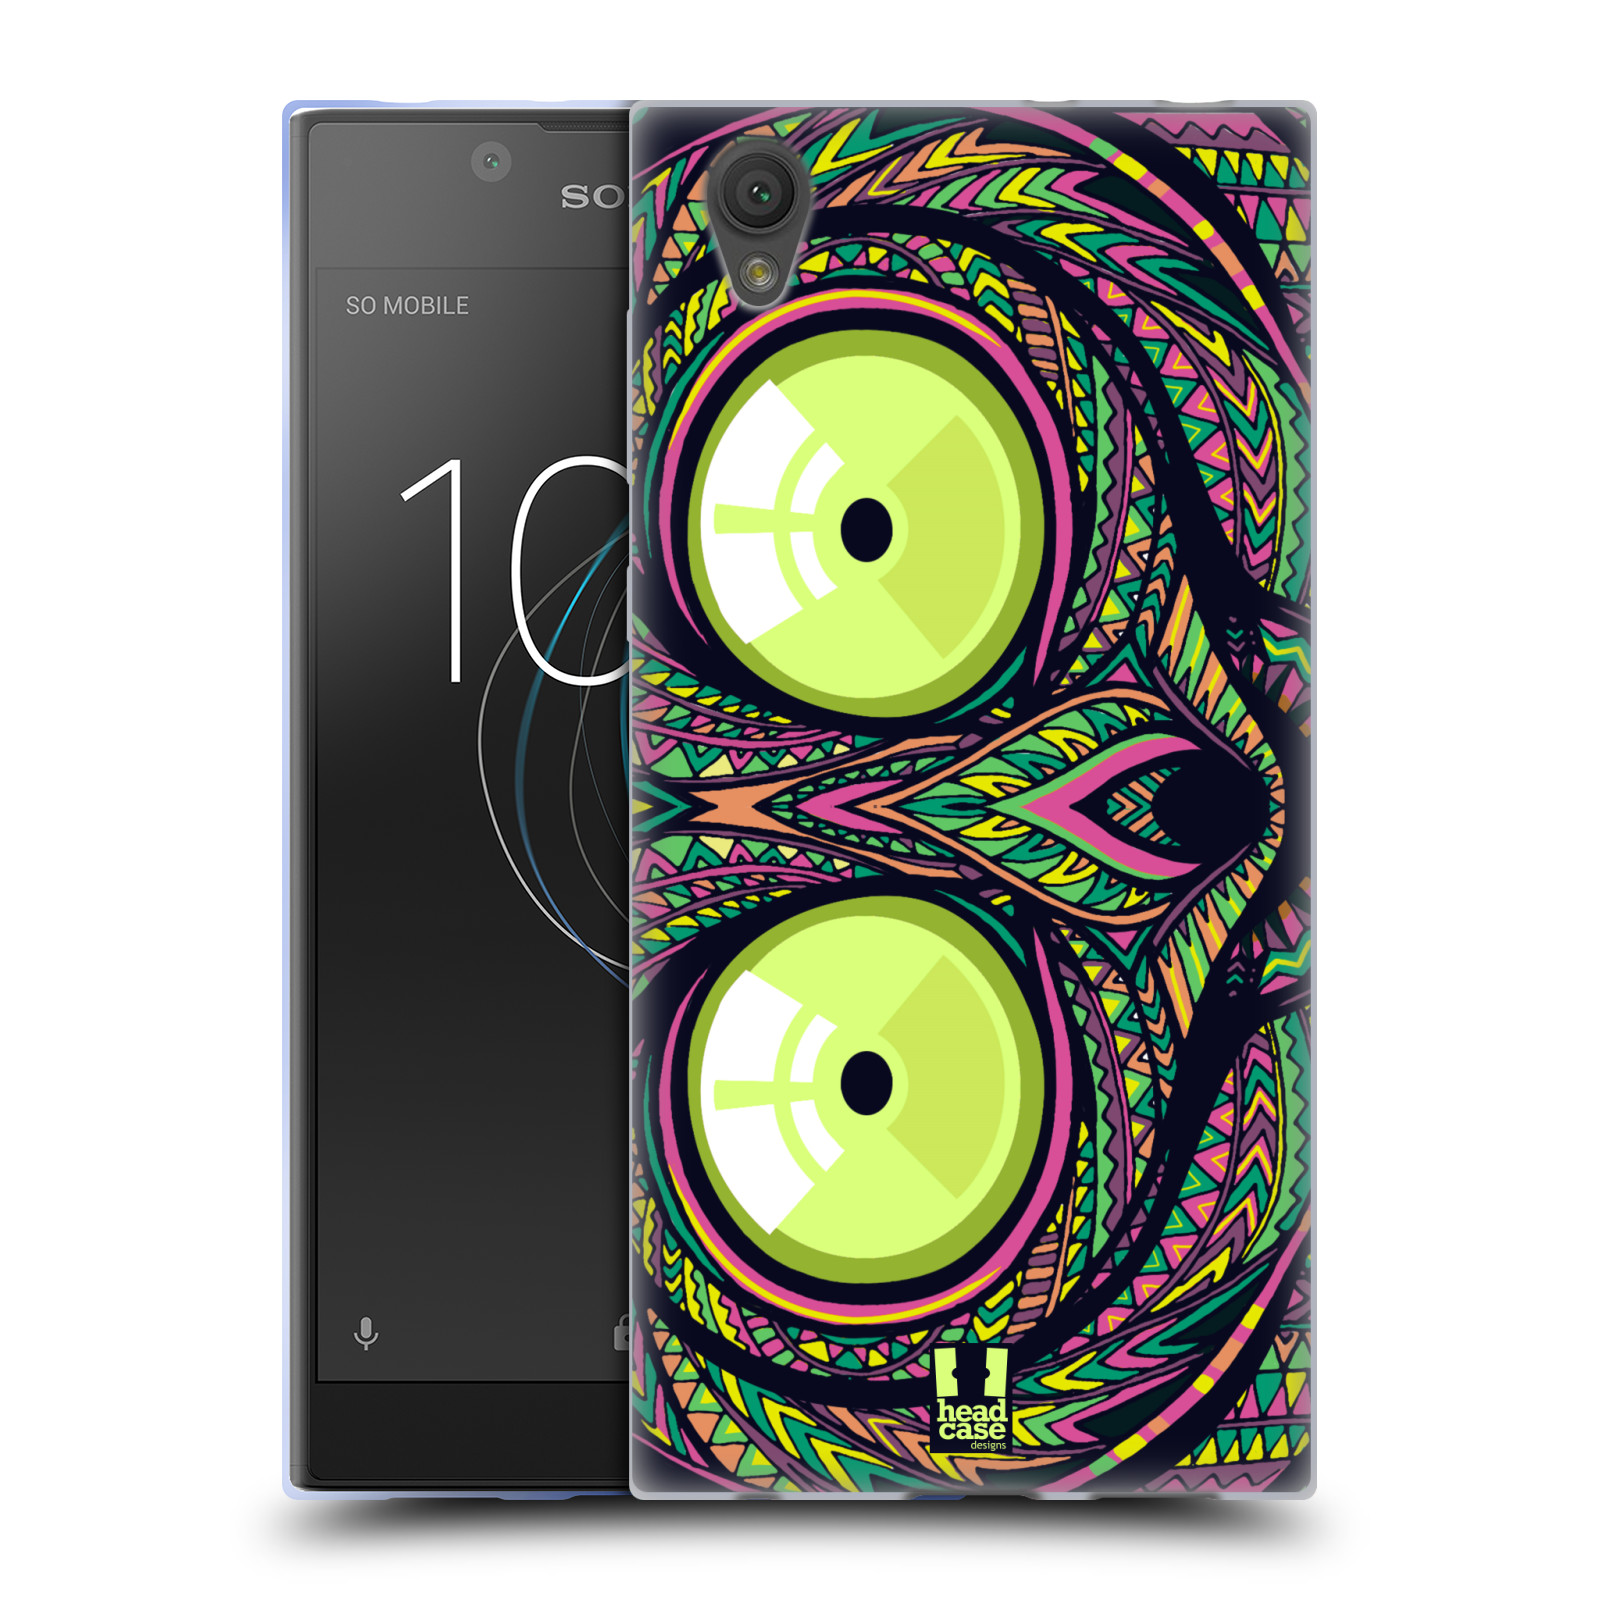 Silikonové pouzdro na mobil Sony Xperia L1 - Head Case - AZTEC NÁRTOUN